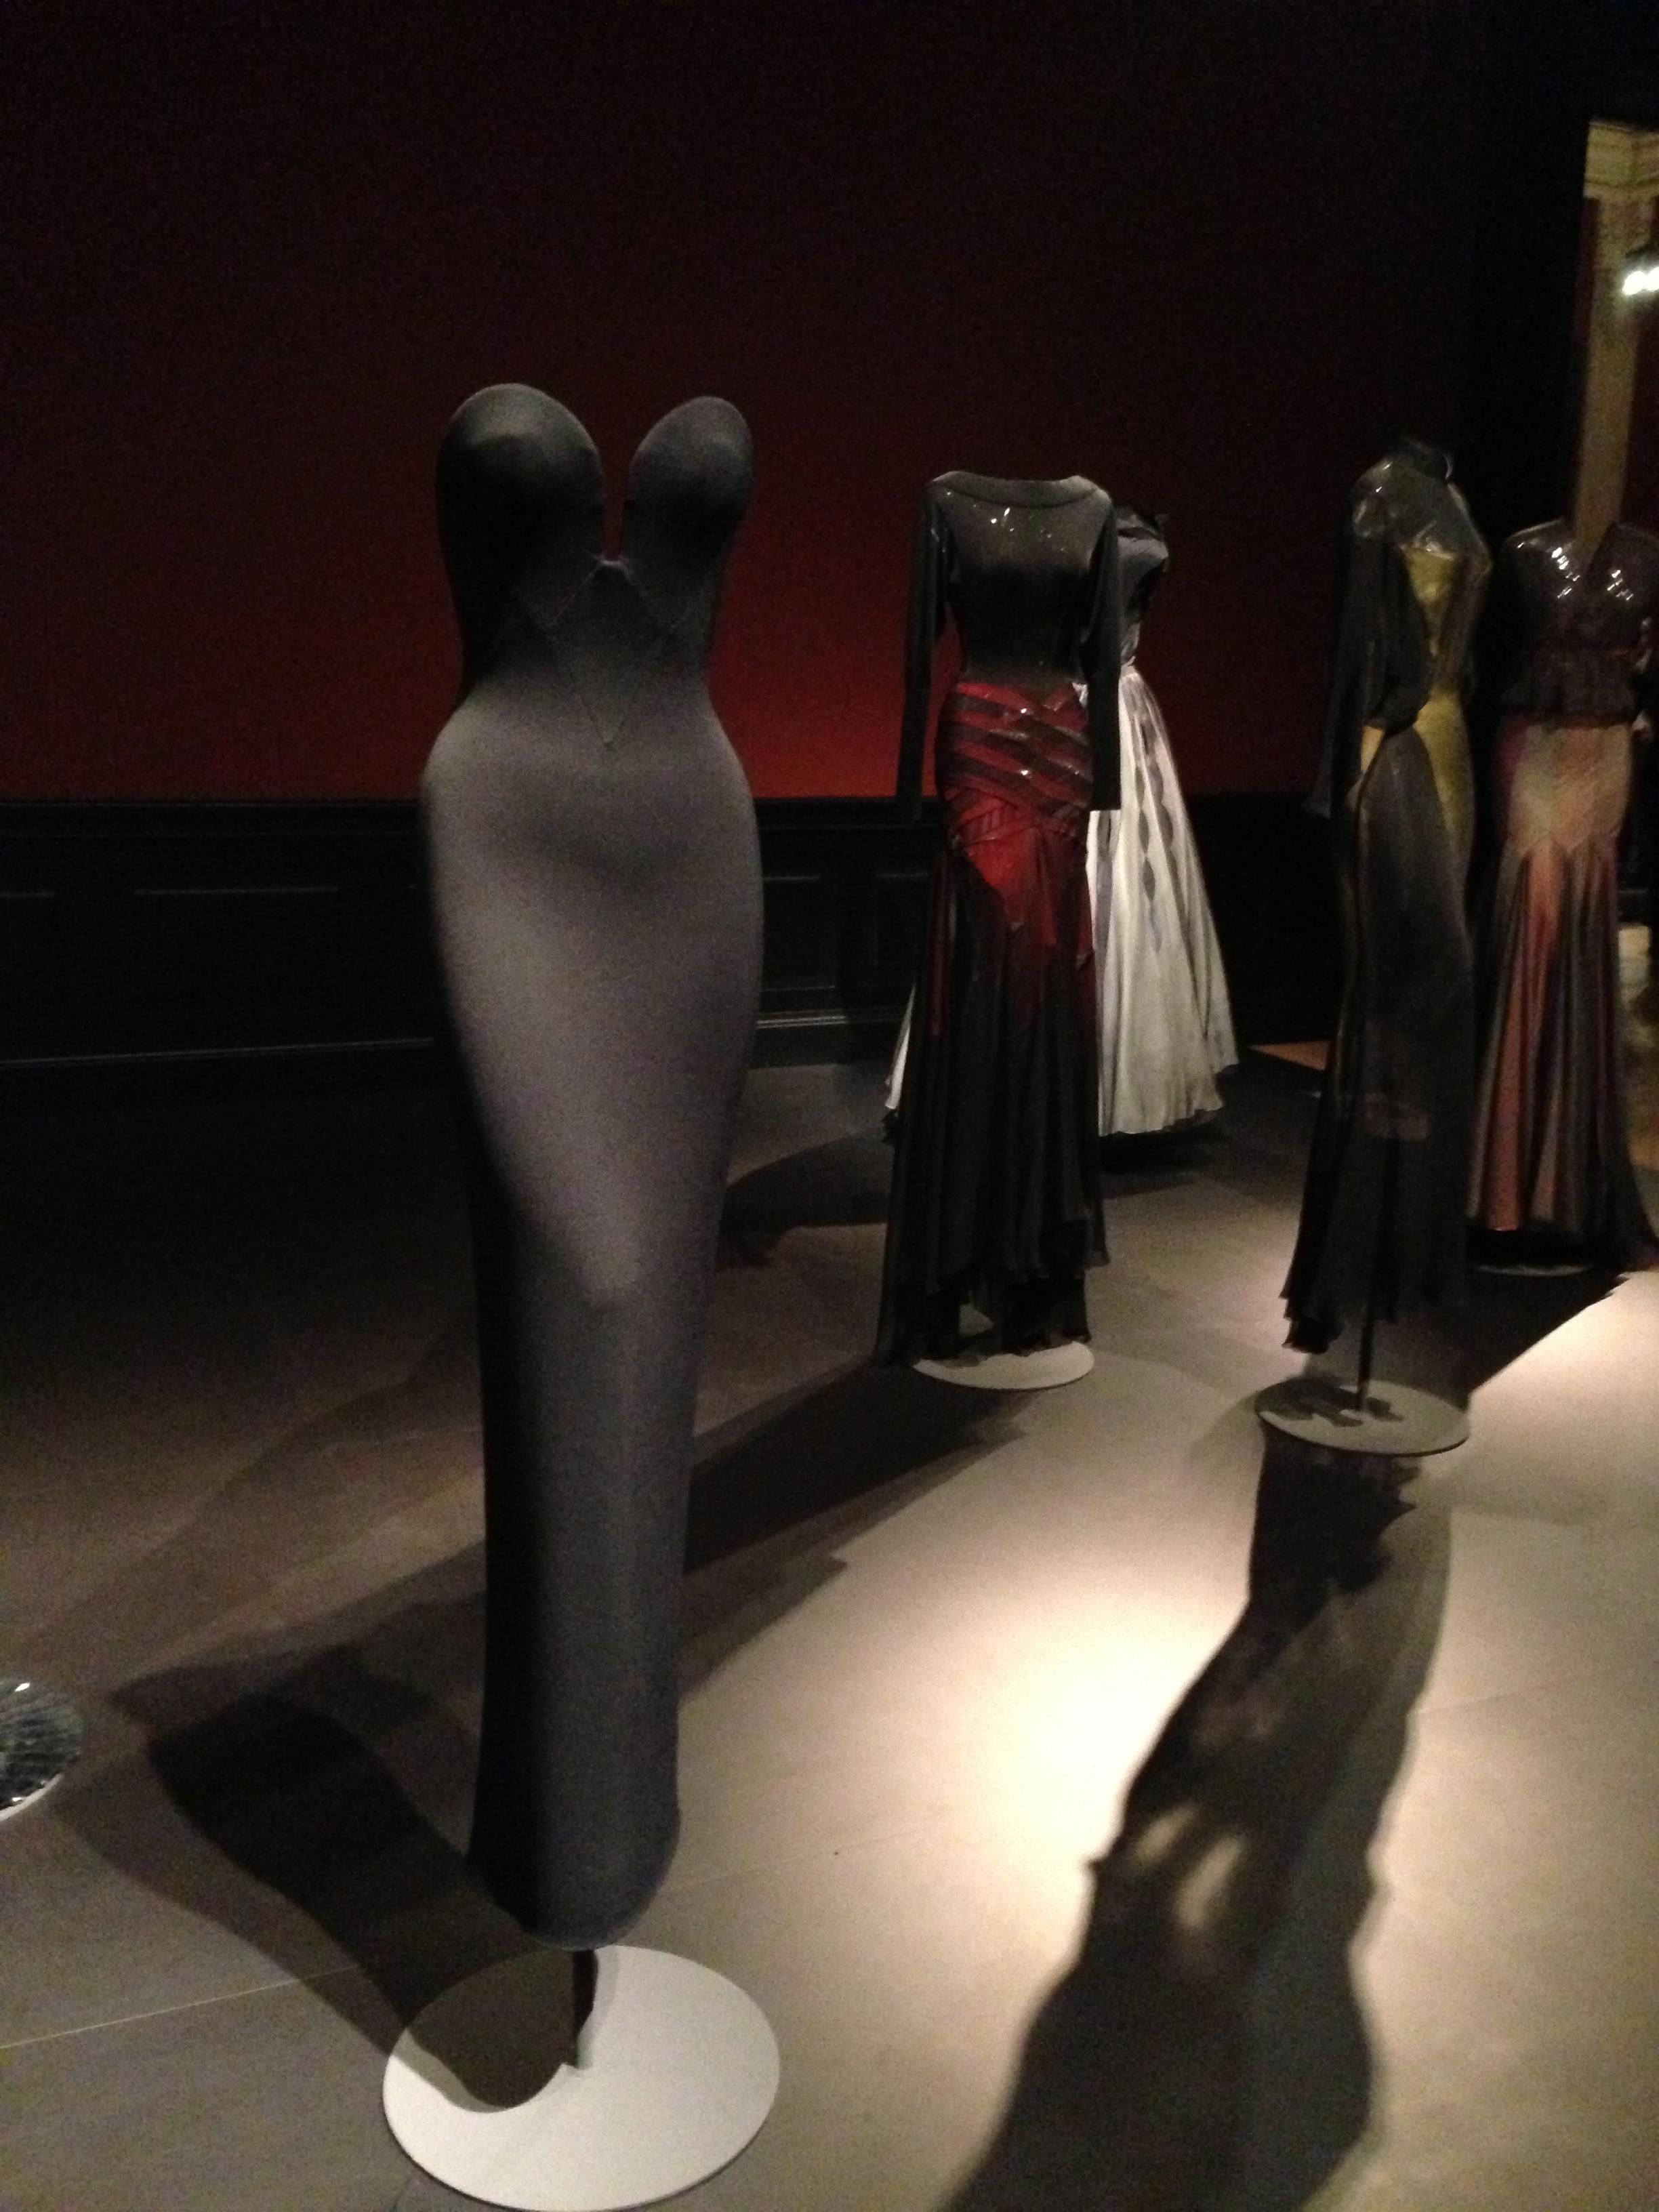 Naomi Cambell, Alaïa exhibition Paris 2013